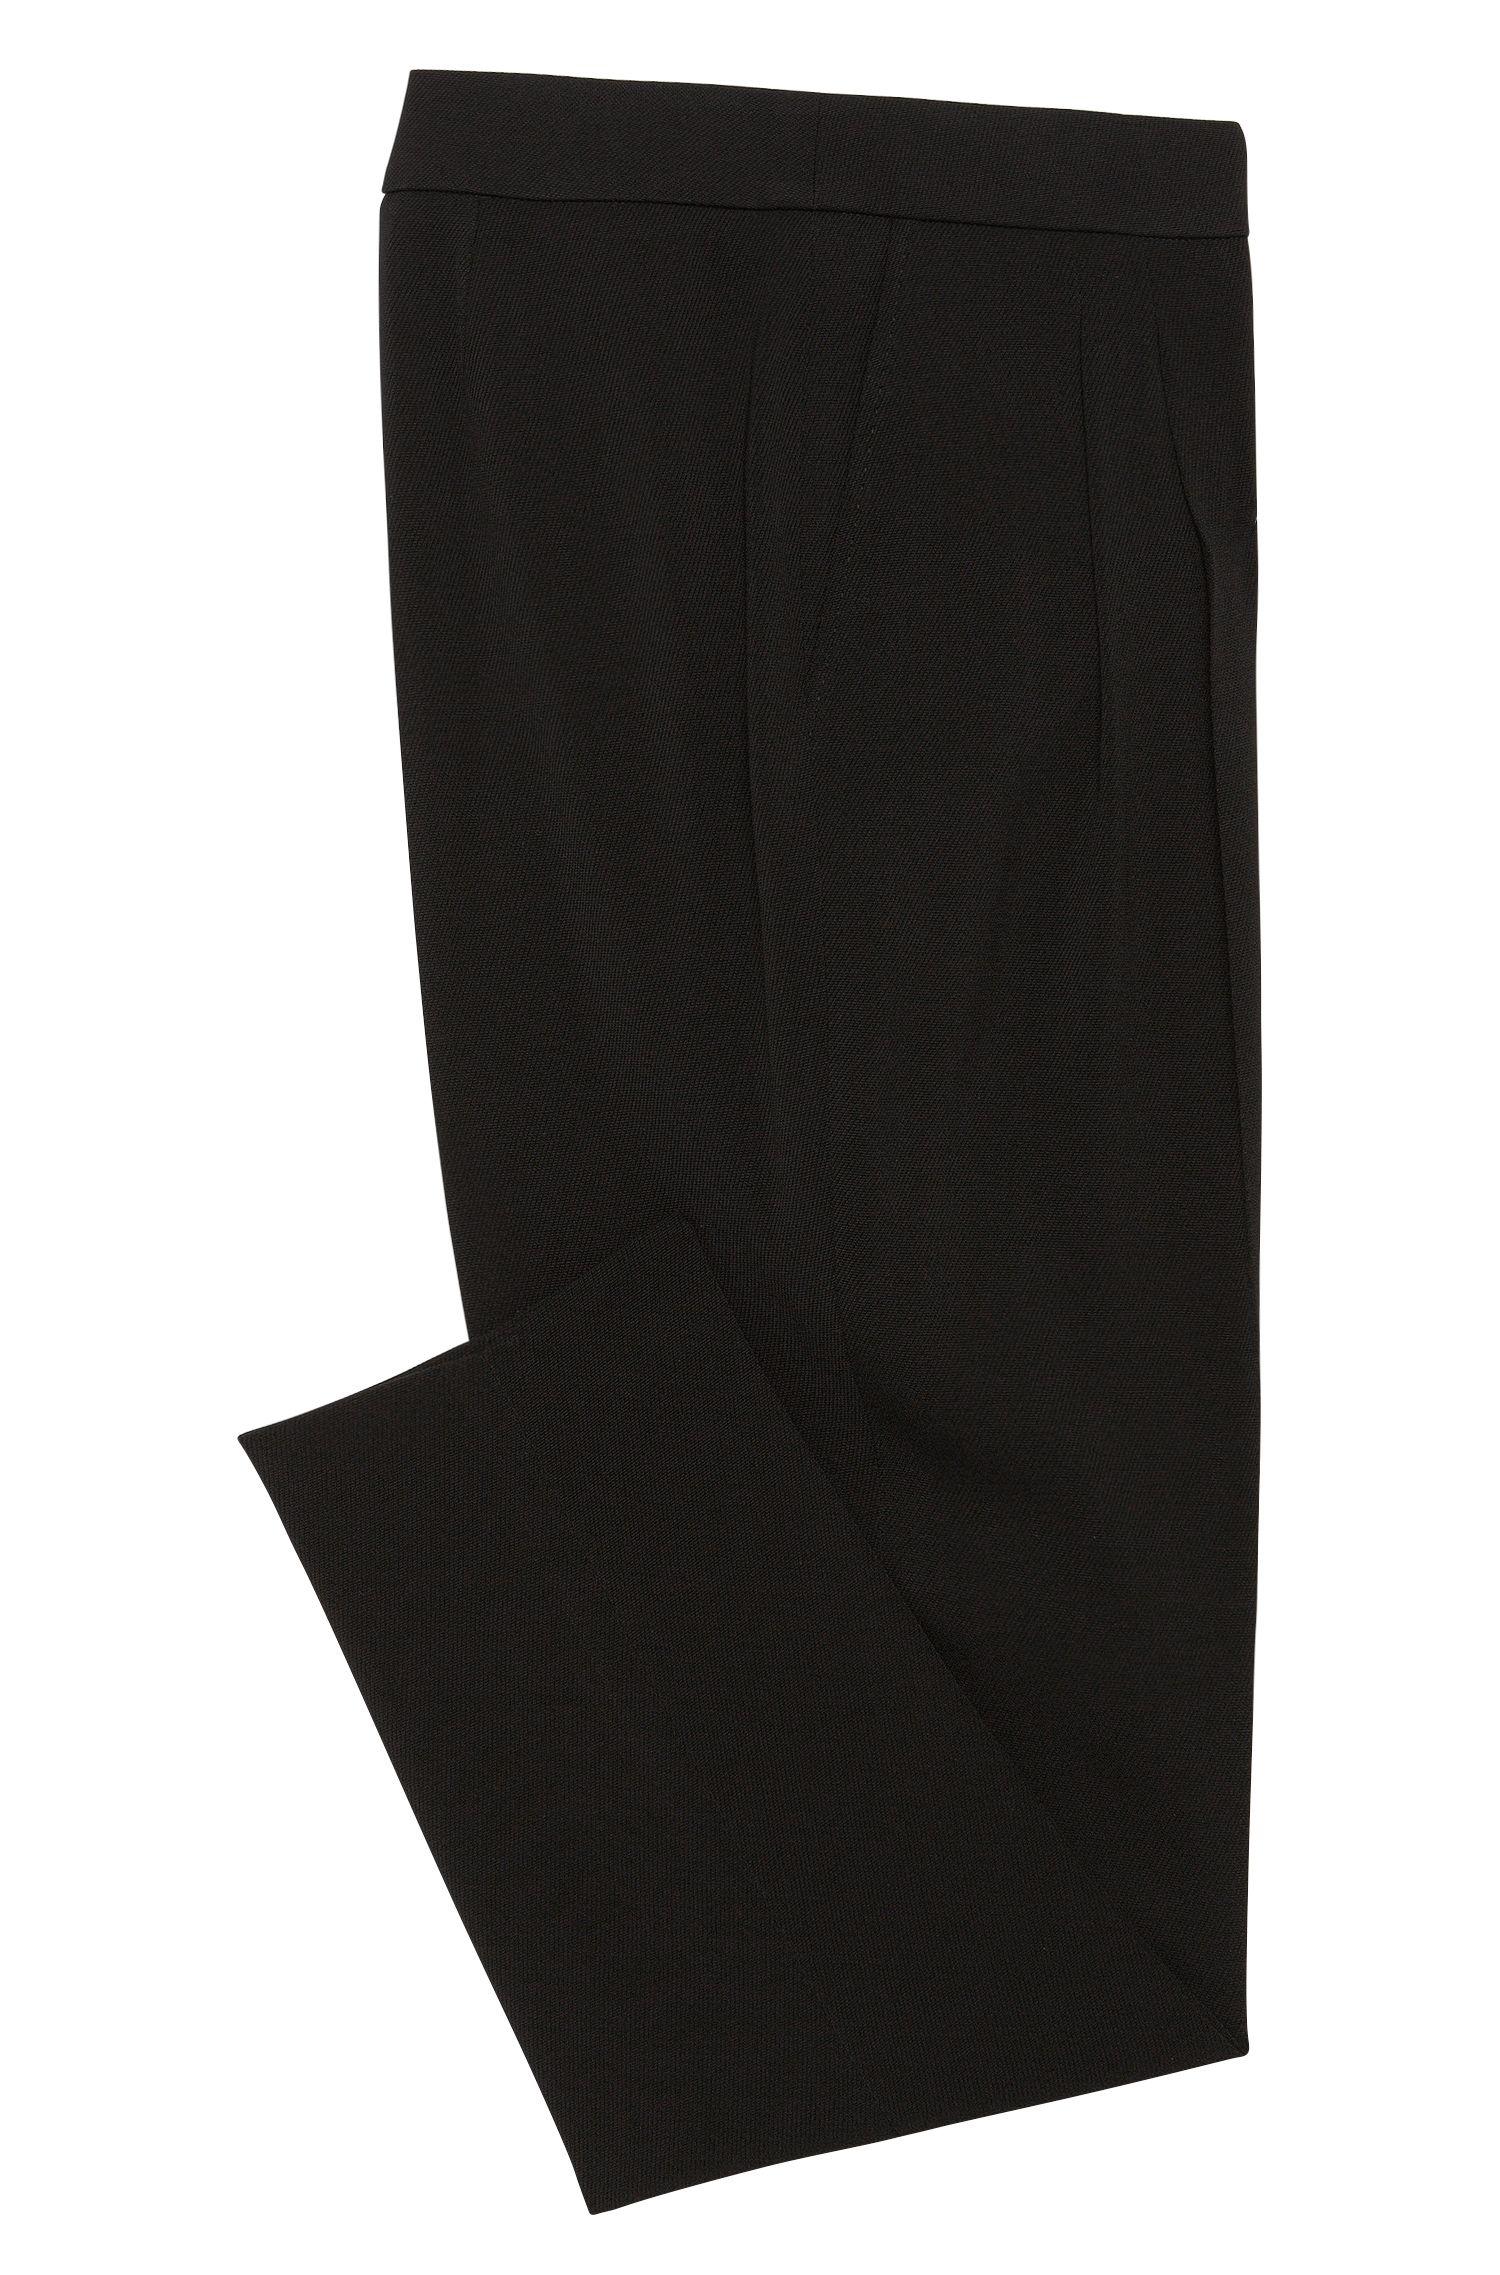 Stretch Crepe Twill Dress Pant | Tolia